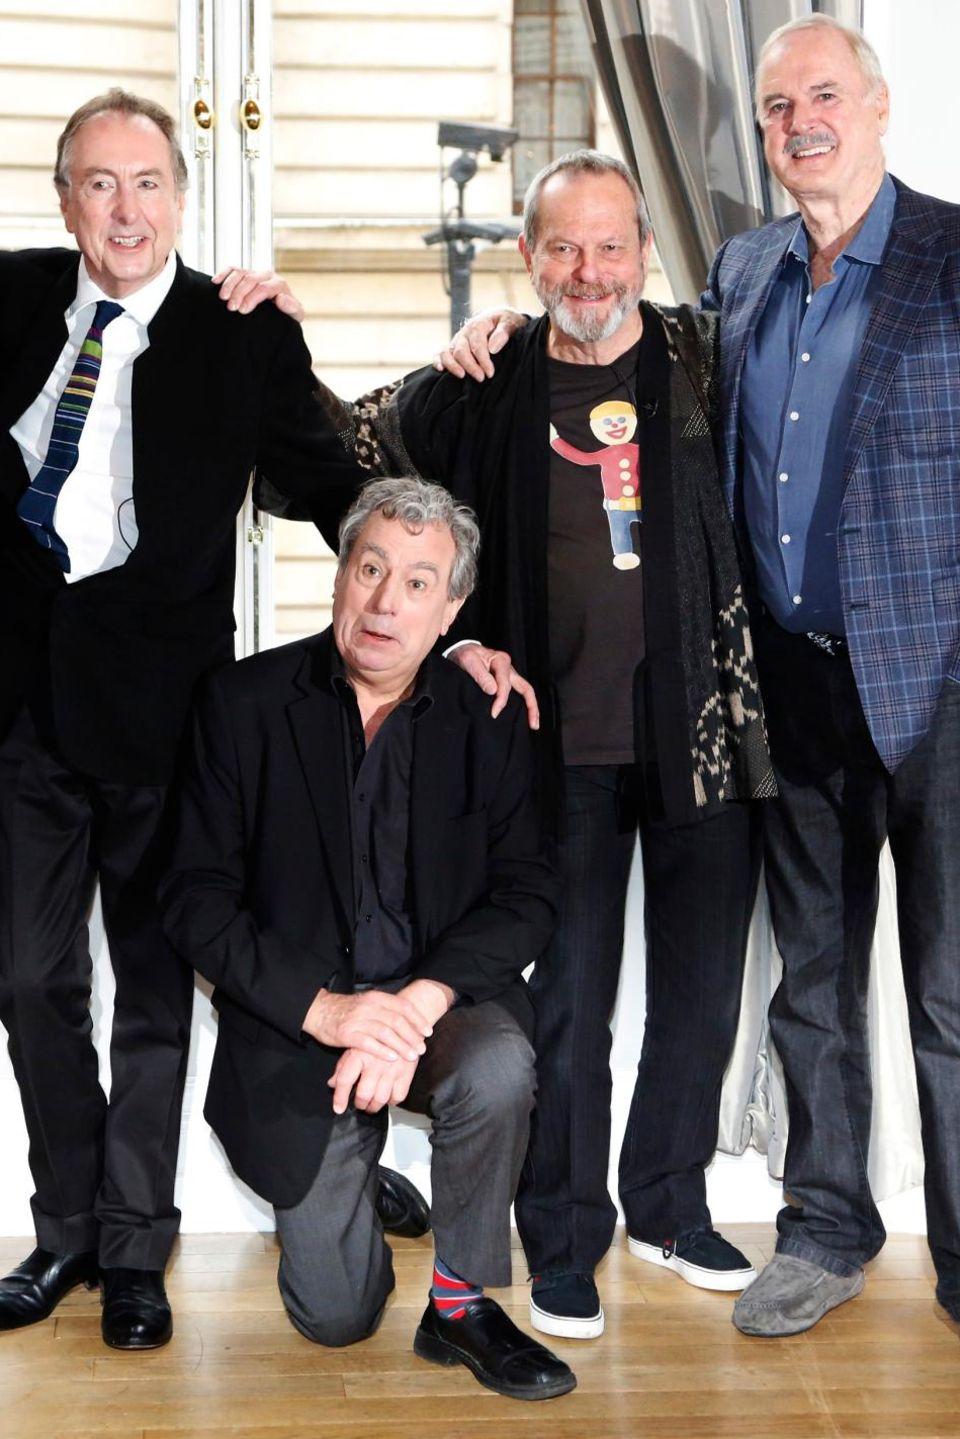 Michael Palin, Eric Idle, Terry Jones, Terry Gilliam und John Cleese